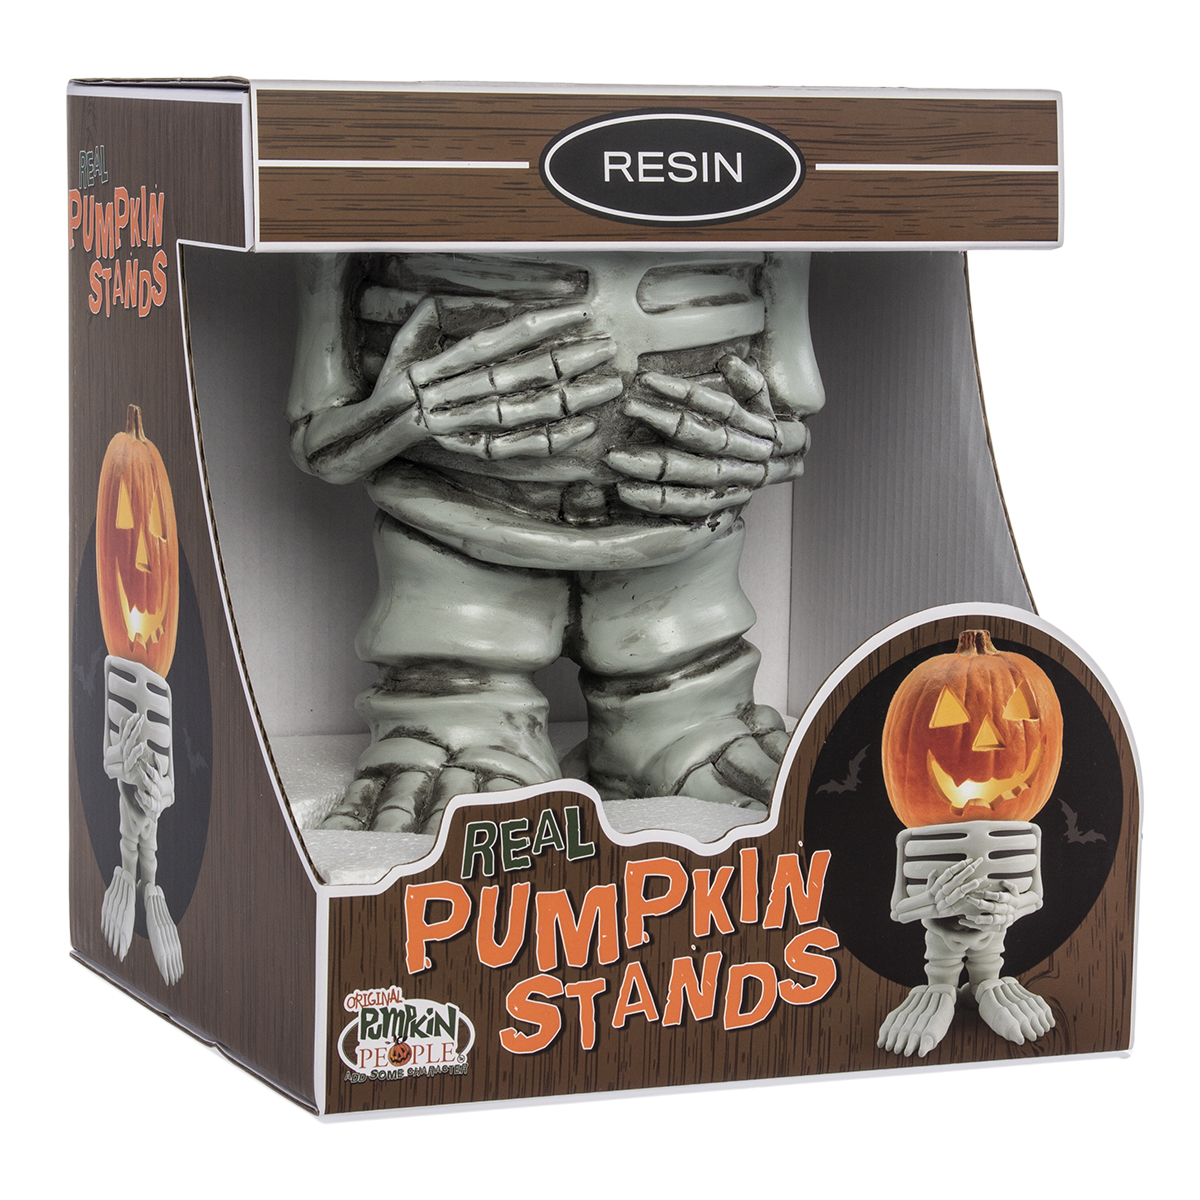 Pumpkin Stand Halloween Display Large Jackolantern Holder